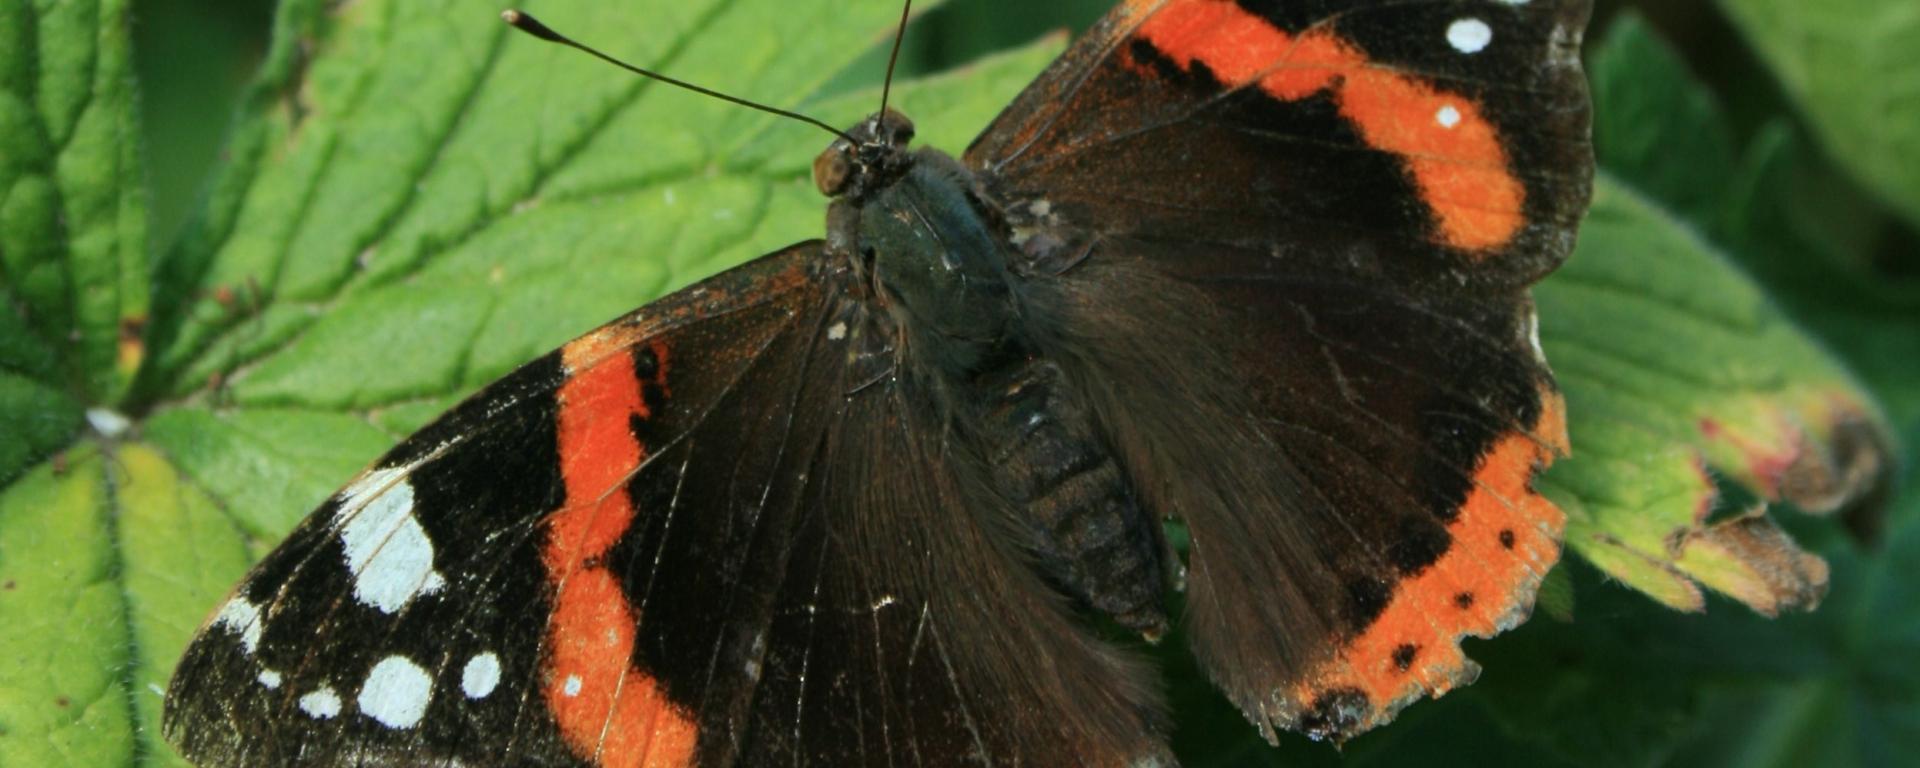 Red admiral butterfly, Vanessa atalanta. Image credit Andrew Bladon